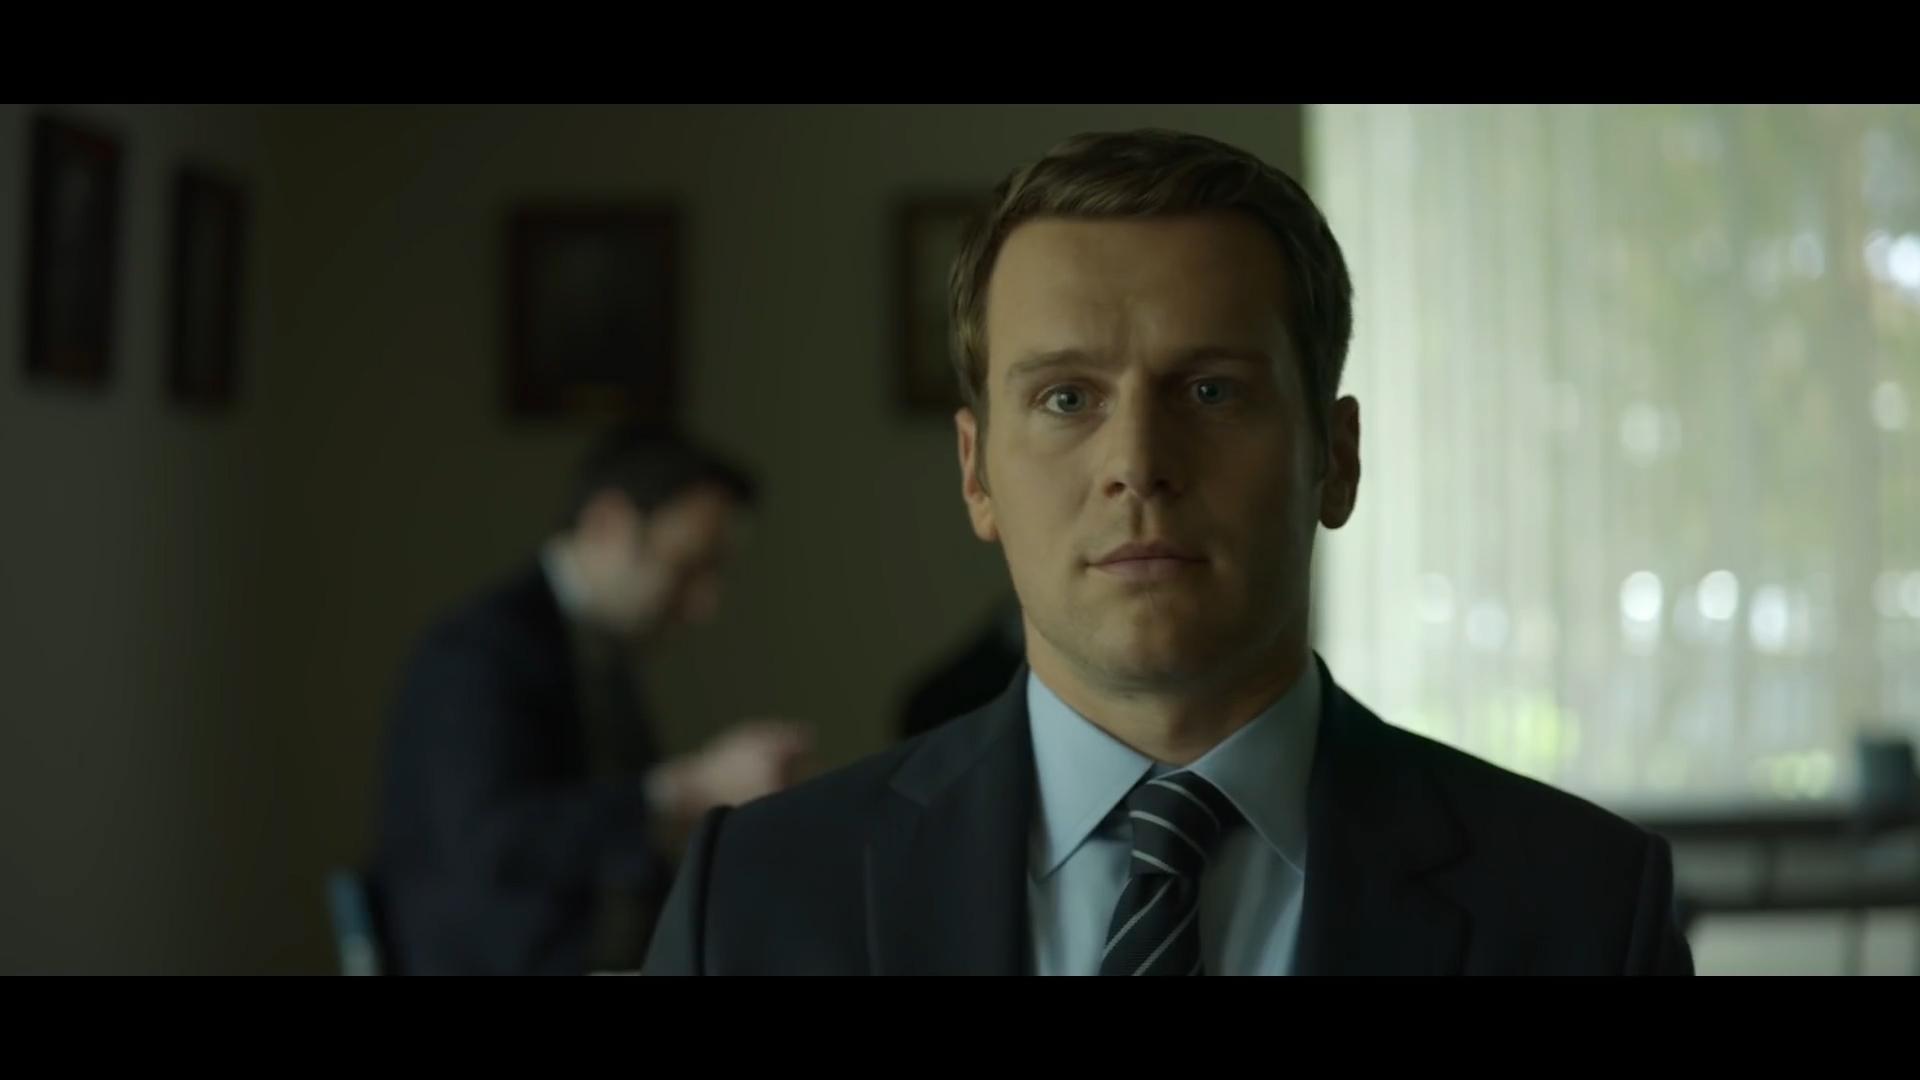 [1] Mindhunter Season 2 Official Trailer